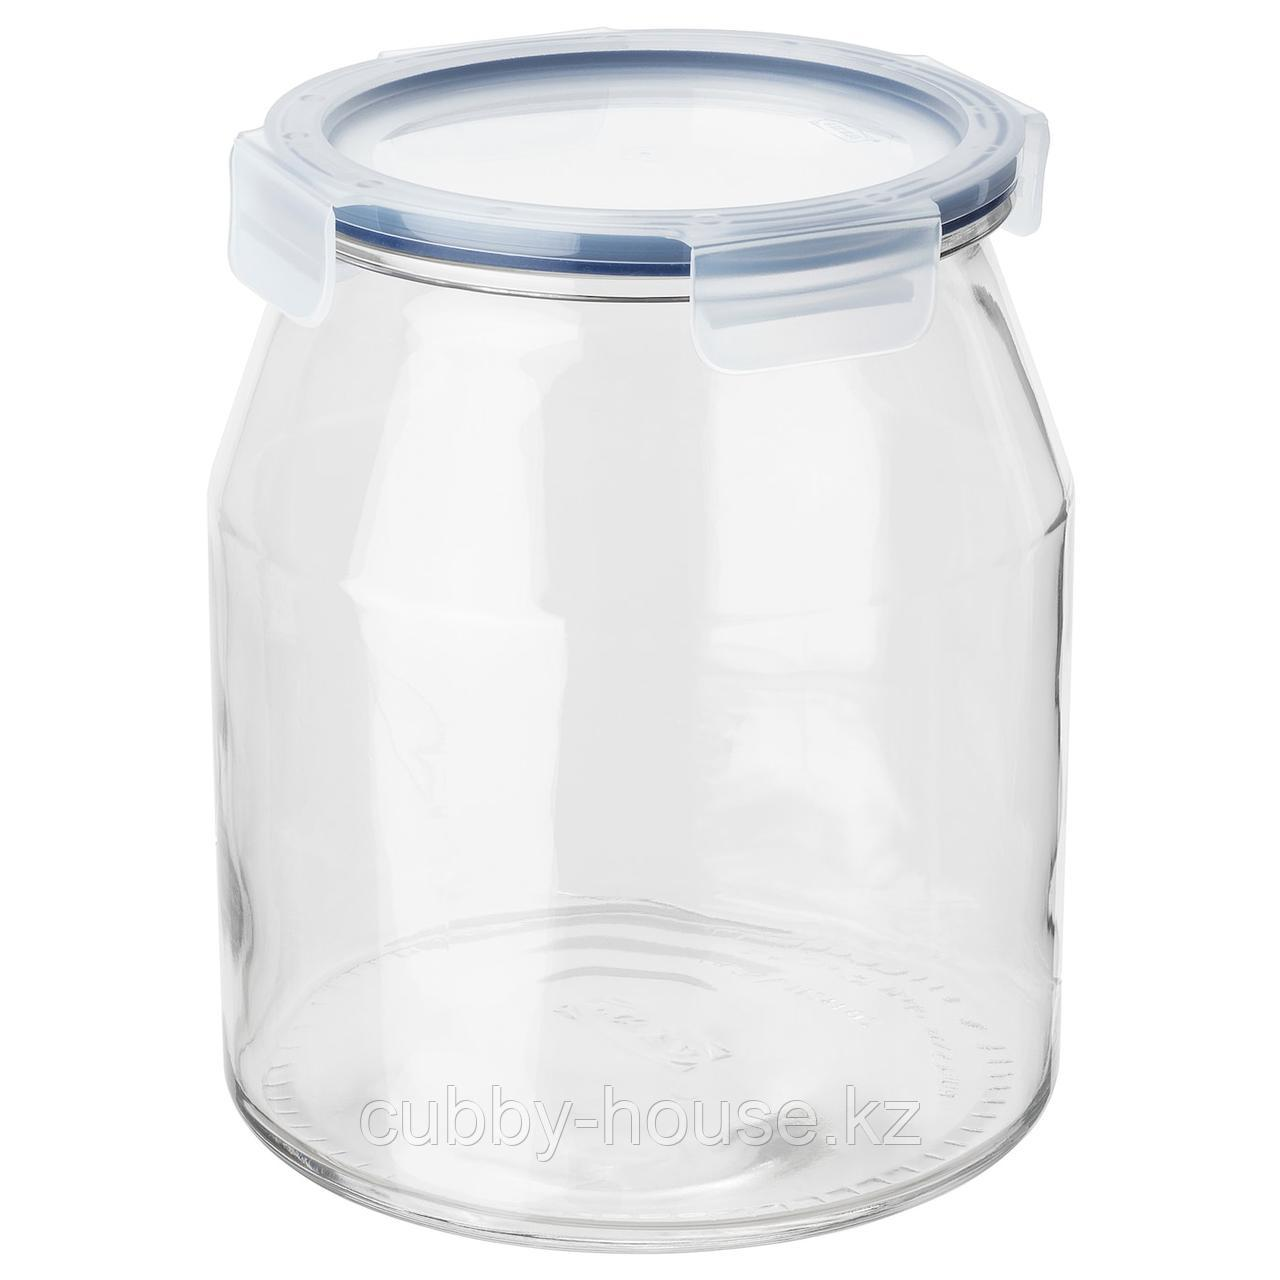 ИКЕА/365+ Банка с крышкой, стекло, пластик, 3.3 л